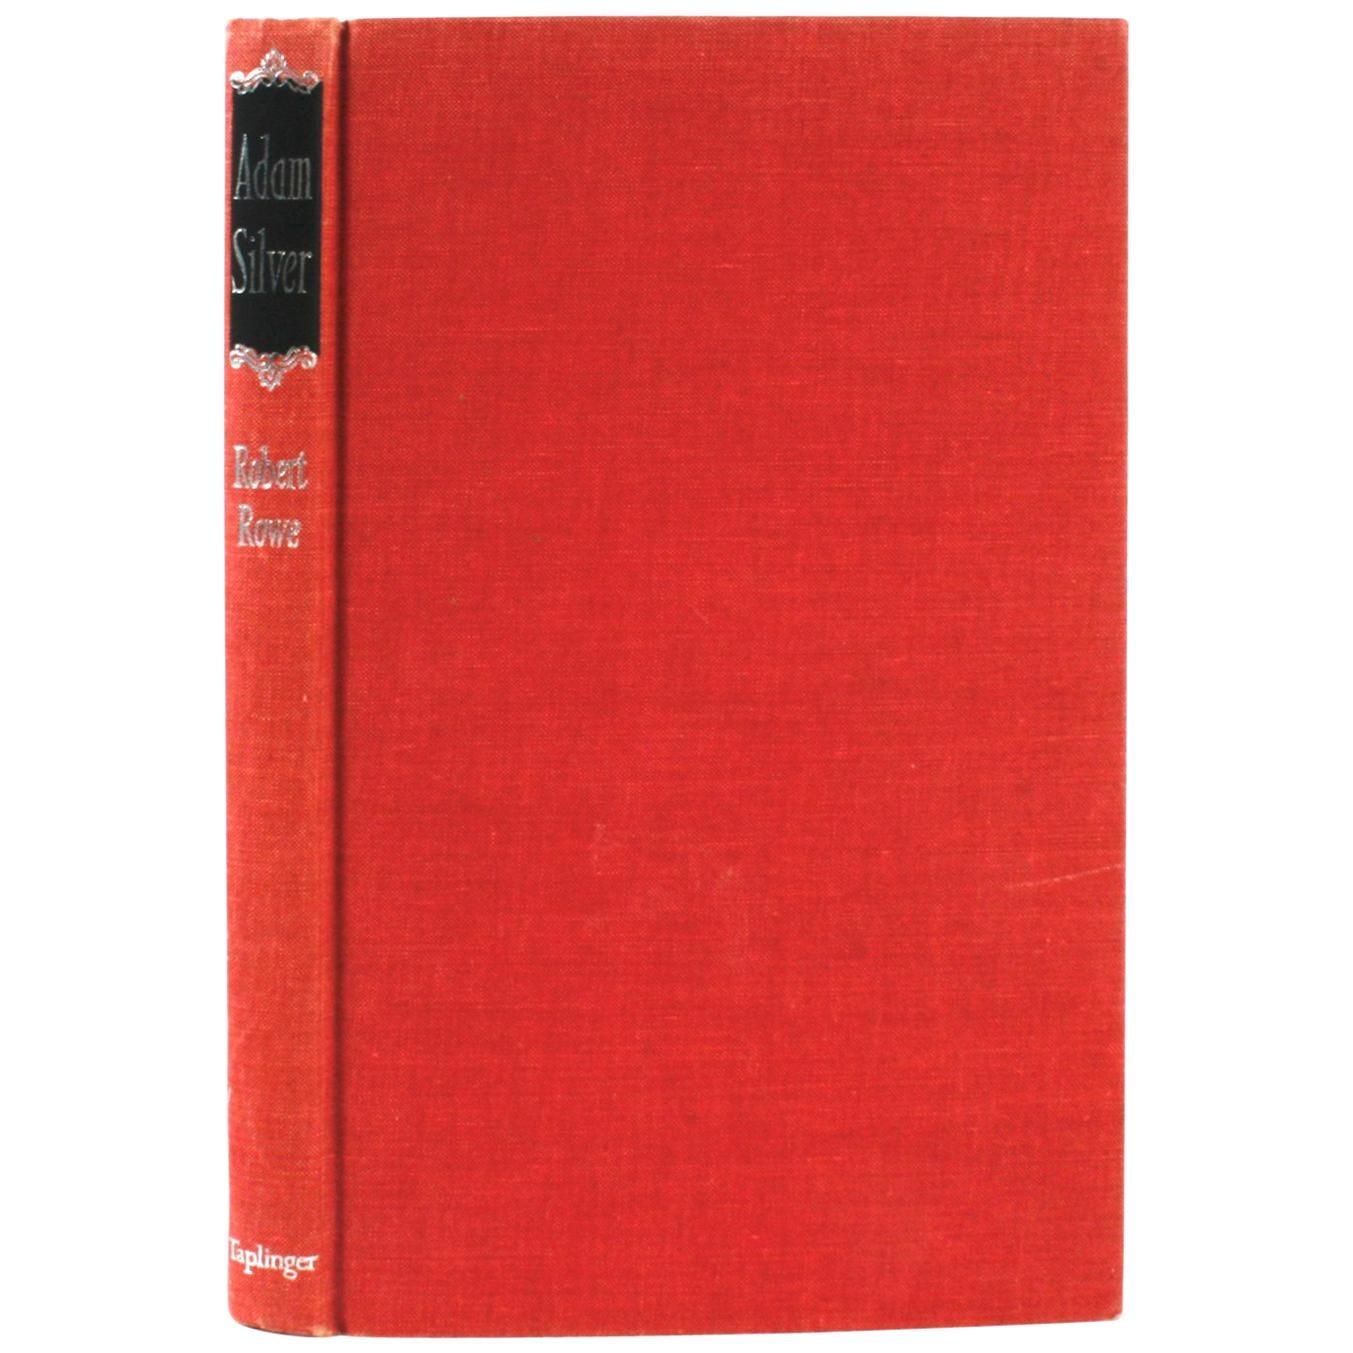 Adam Silver 1765-1795 by Robert Rowe, 1st Edition